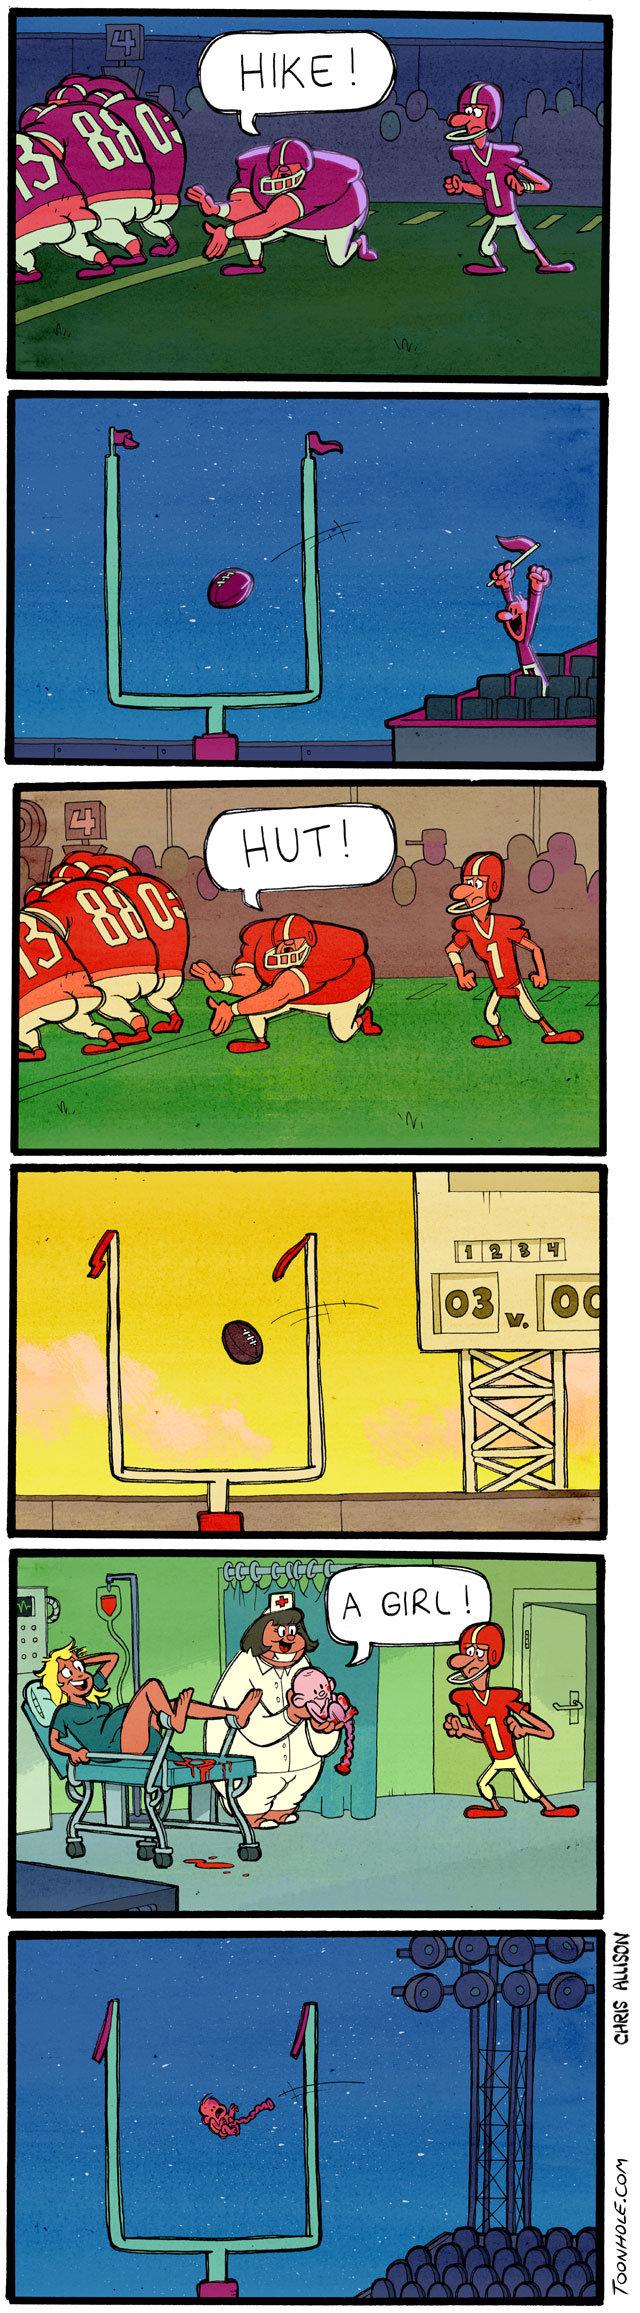 hut..hike!. MVP! MVP! MVP!! moar at Toonhole.com. toonhole toon cartoon comic webcomic football kicker hike hut baby punt